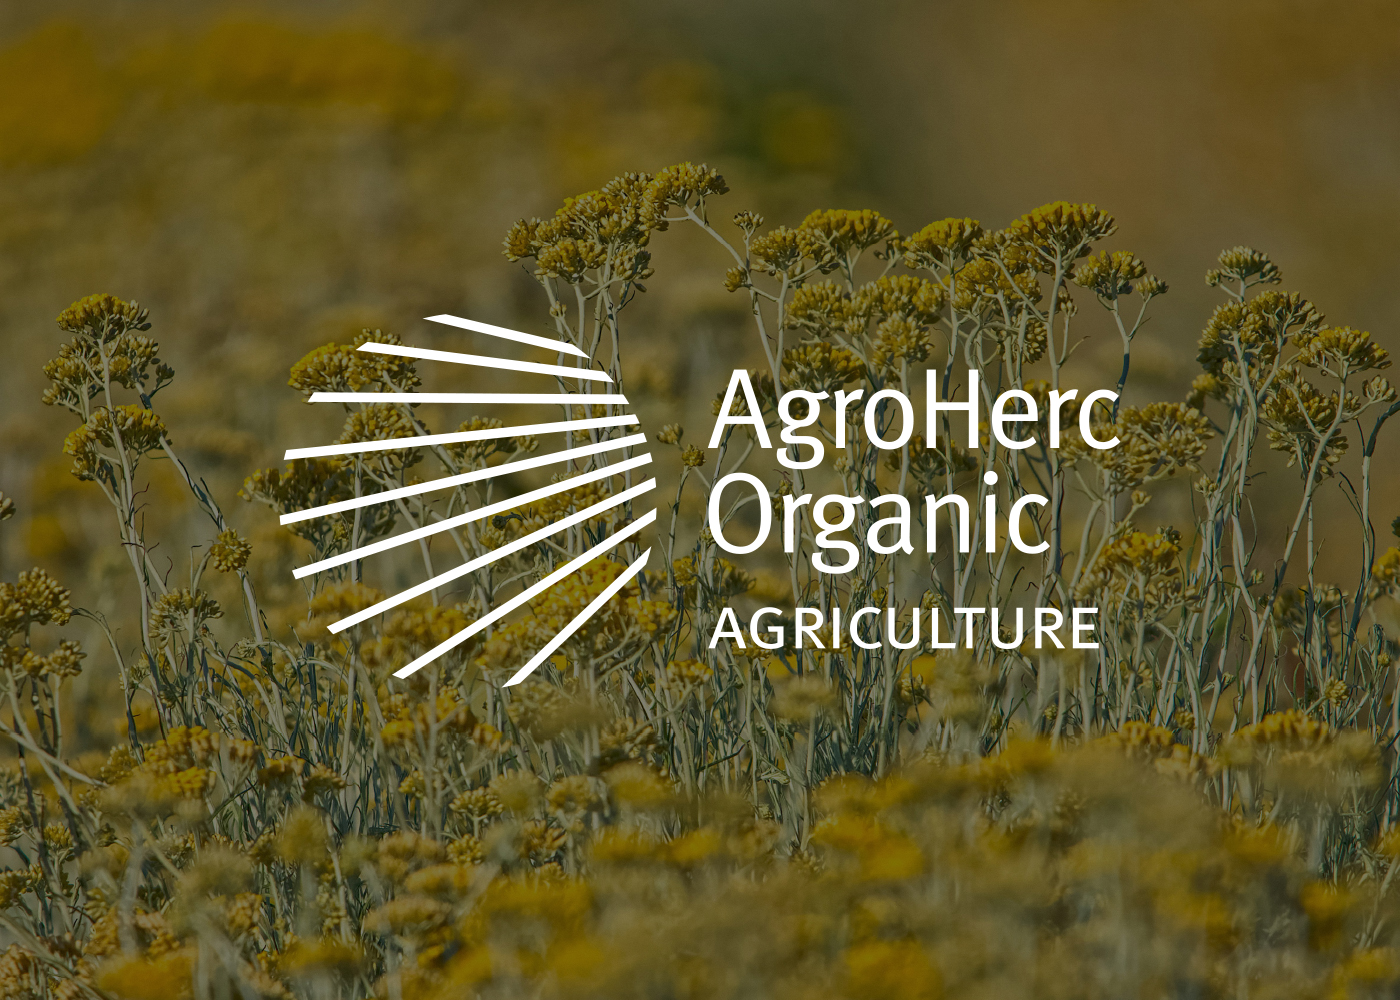 Vizualni identitet tvrtke AgroHerc Organic Agriculture